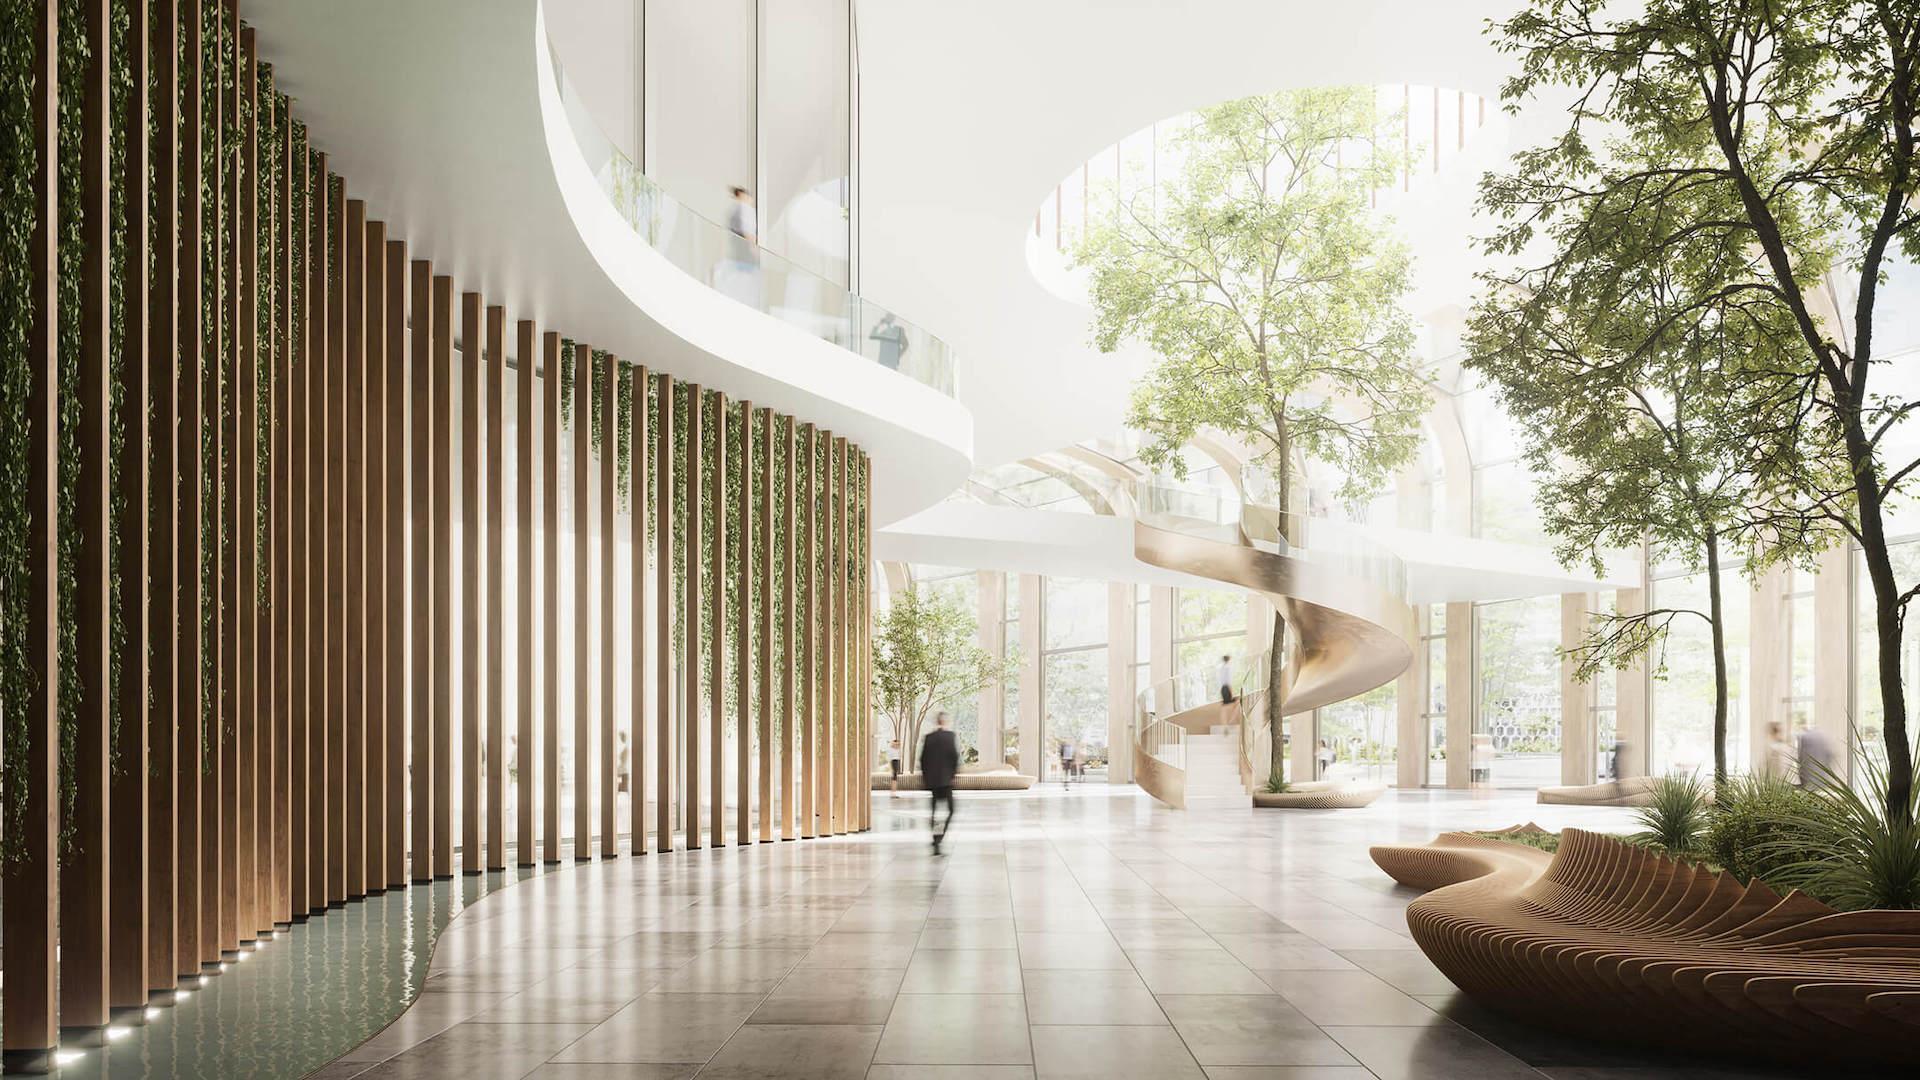 High-Quality 3D Render for a Business Center Interior Concept